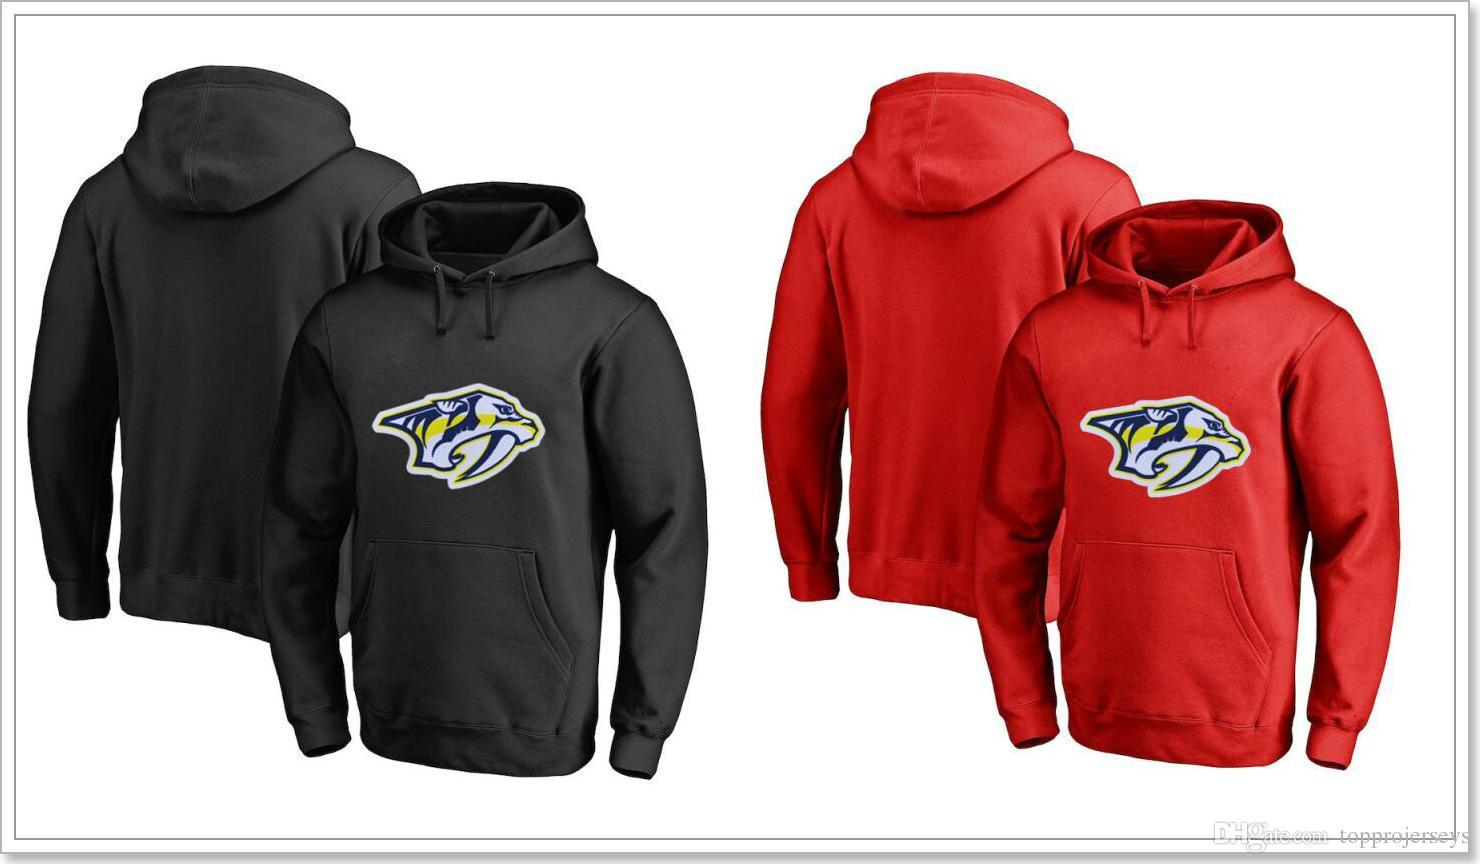 Nashville Predators Mens Vintage Ice Hockey Shirts Sweatershirts Uniforms Hoodies Stitched Embroidery Blank Cheap Sports Jerseys For Sale